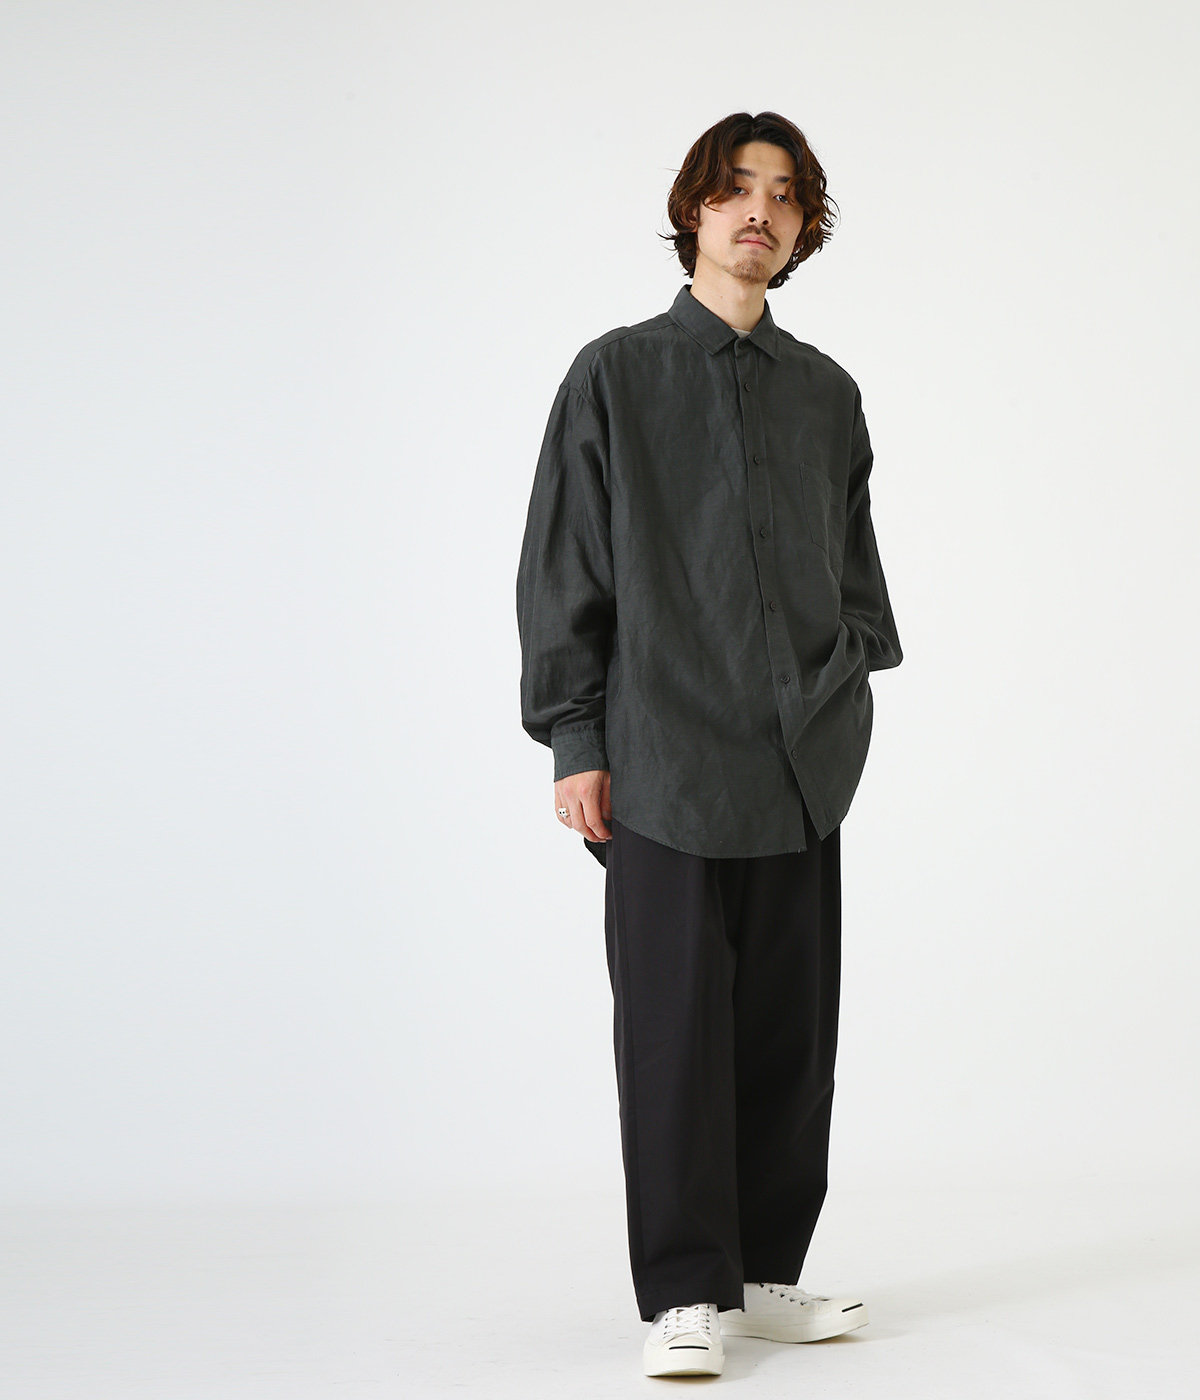 WIDE FIT SHIRT - cu/li/co cloth -